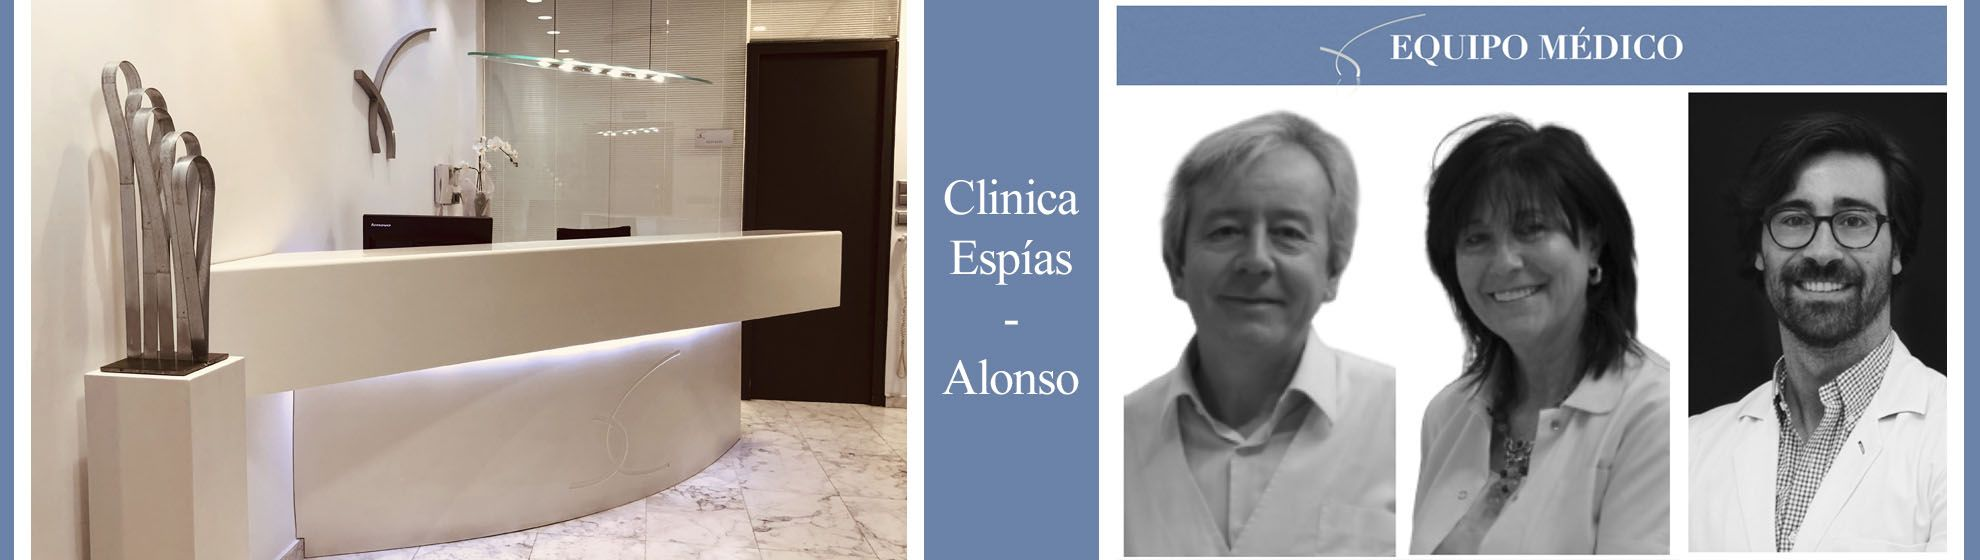 Clínica Espías-Alonso